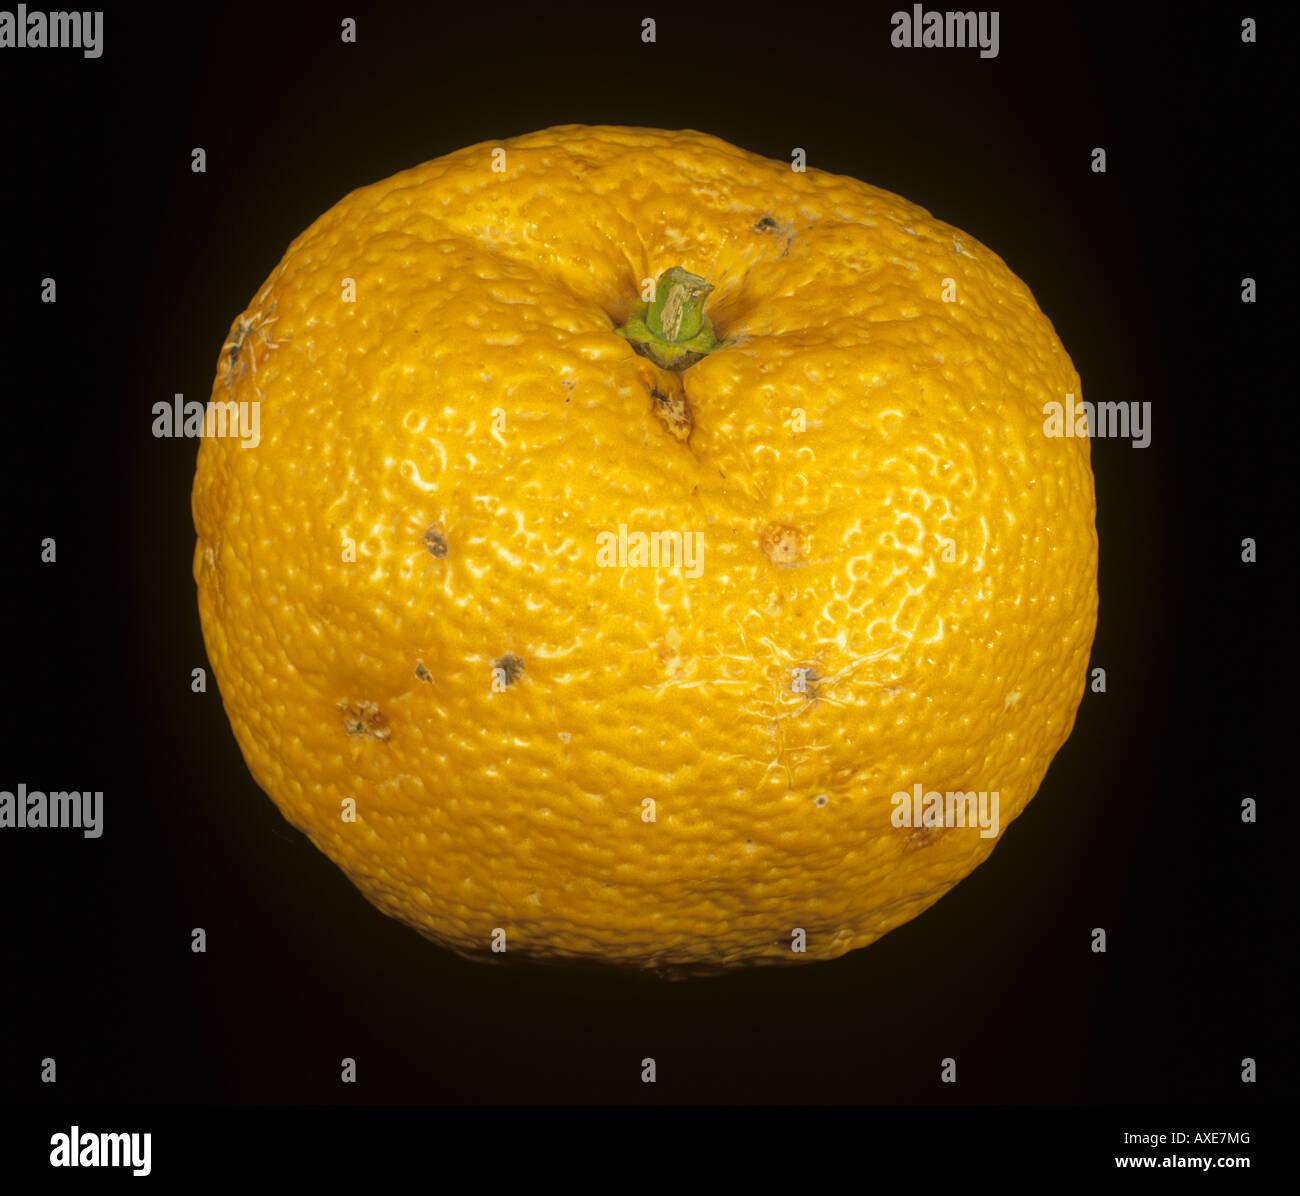 Whole citrus rootstock fruit Citrus junos variety Yuzu - Stock Image